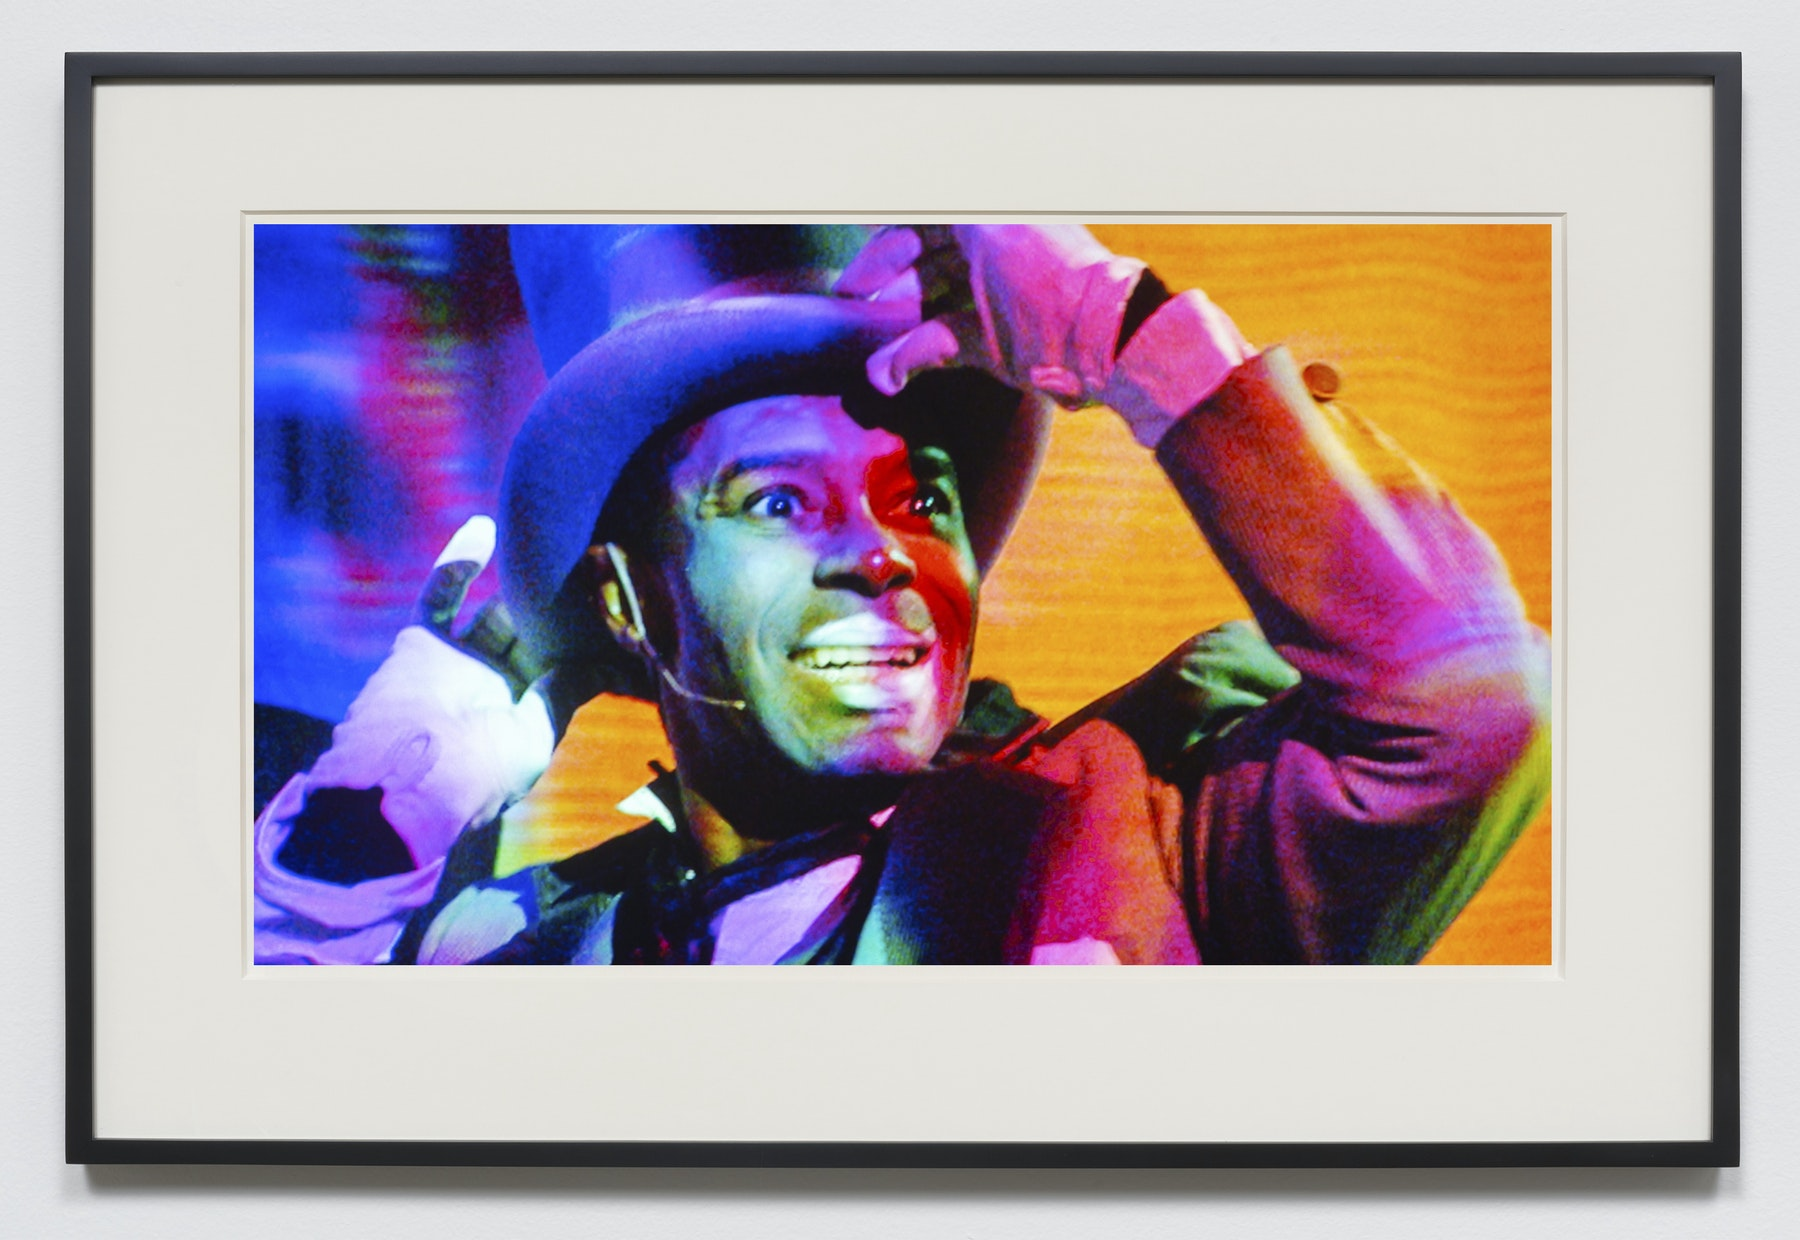 "Edgar Arceneaux ""White Light,"" 2015-2020 Photographic print 20 x 36"" [HxW] (50.8 x 91.44 cm) unframed, 23.5 x 39.5 x 2"" [HxWxD] (59.69 x 100.33 x 5.08 cm) framed Edition 1 of 5, 2 AP Inventory #ARC632.01 Courtesy of the artist and Vielmetter Los Angeles"